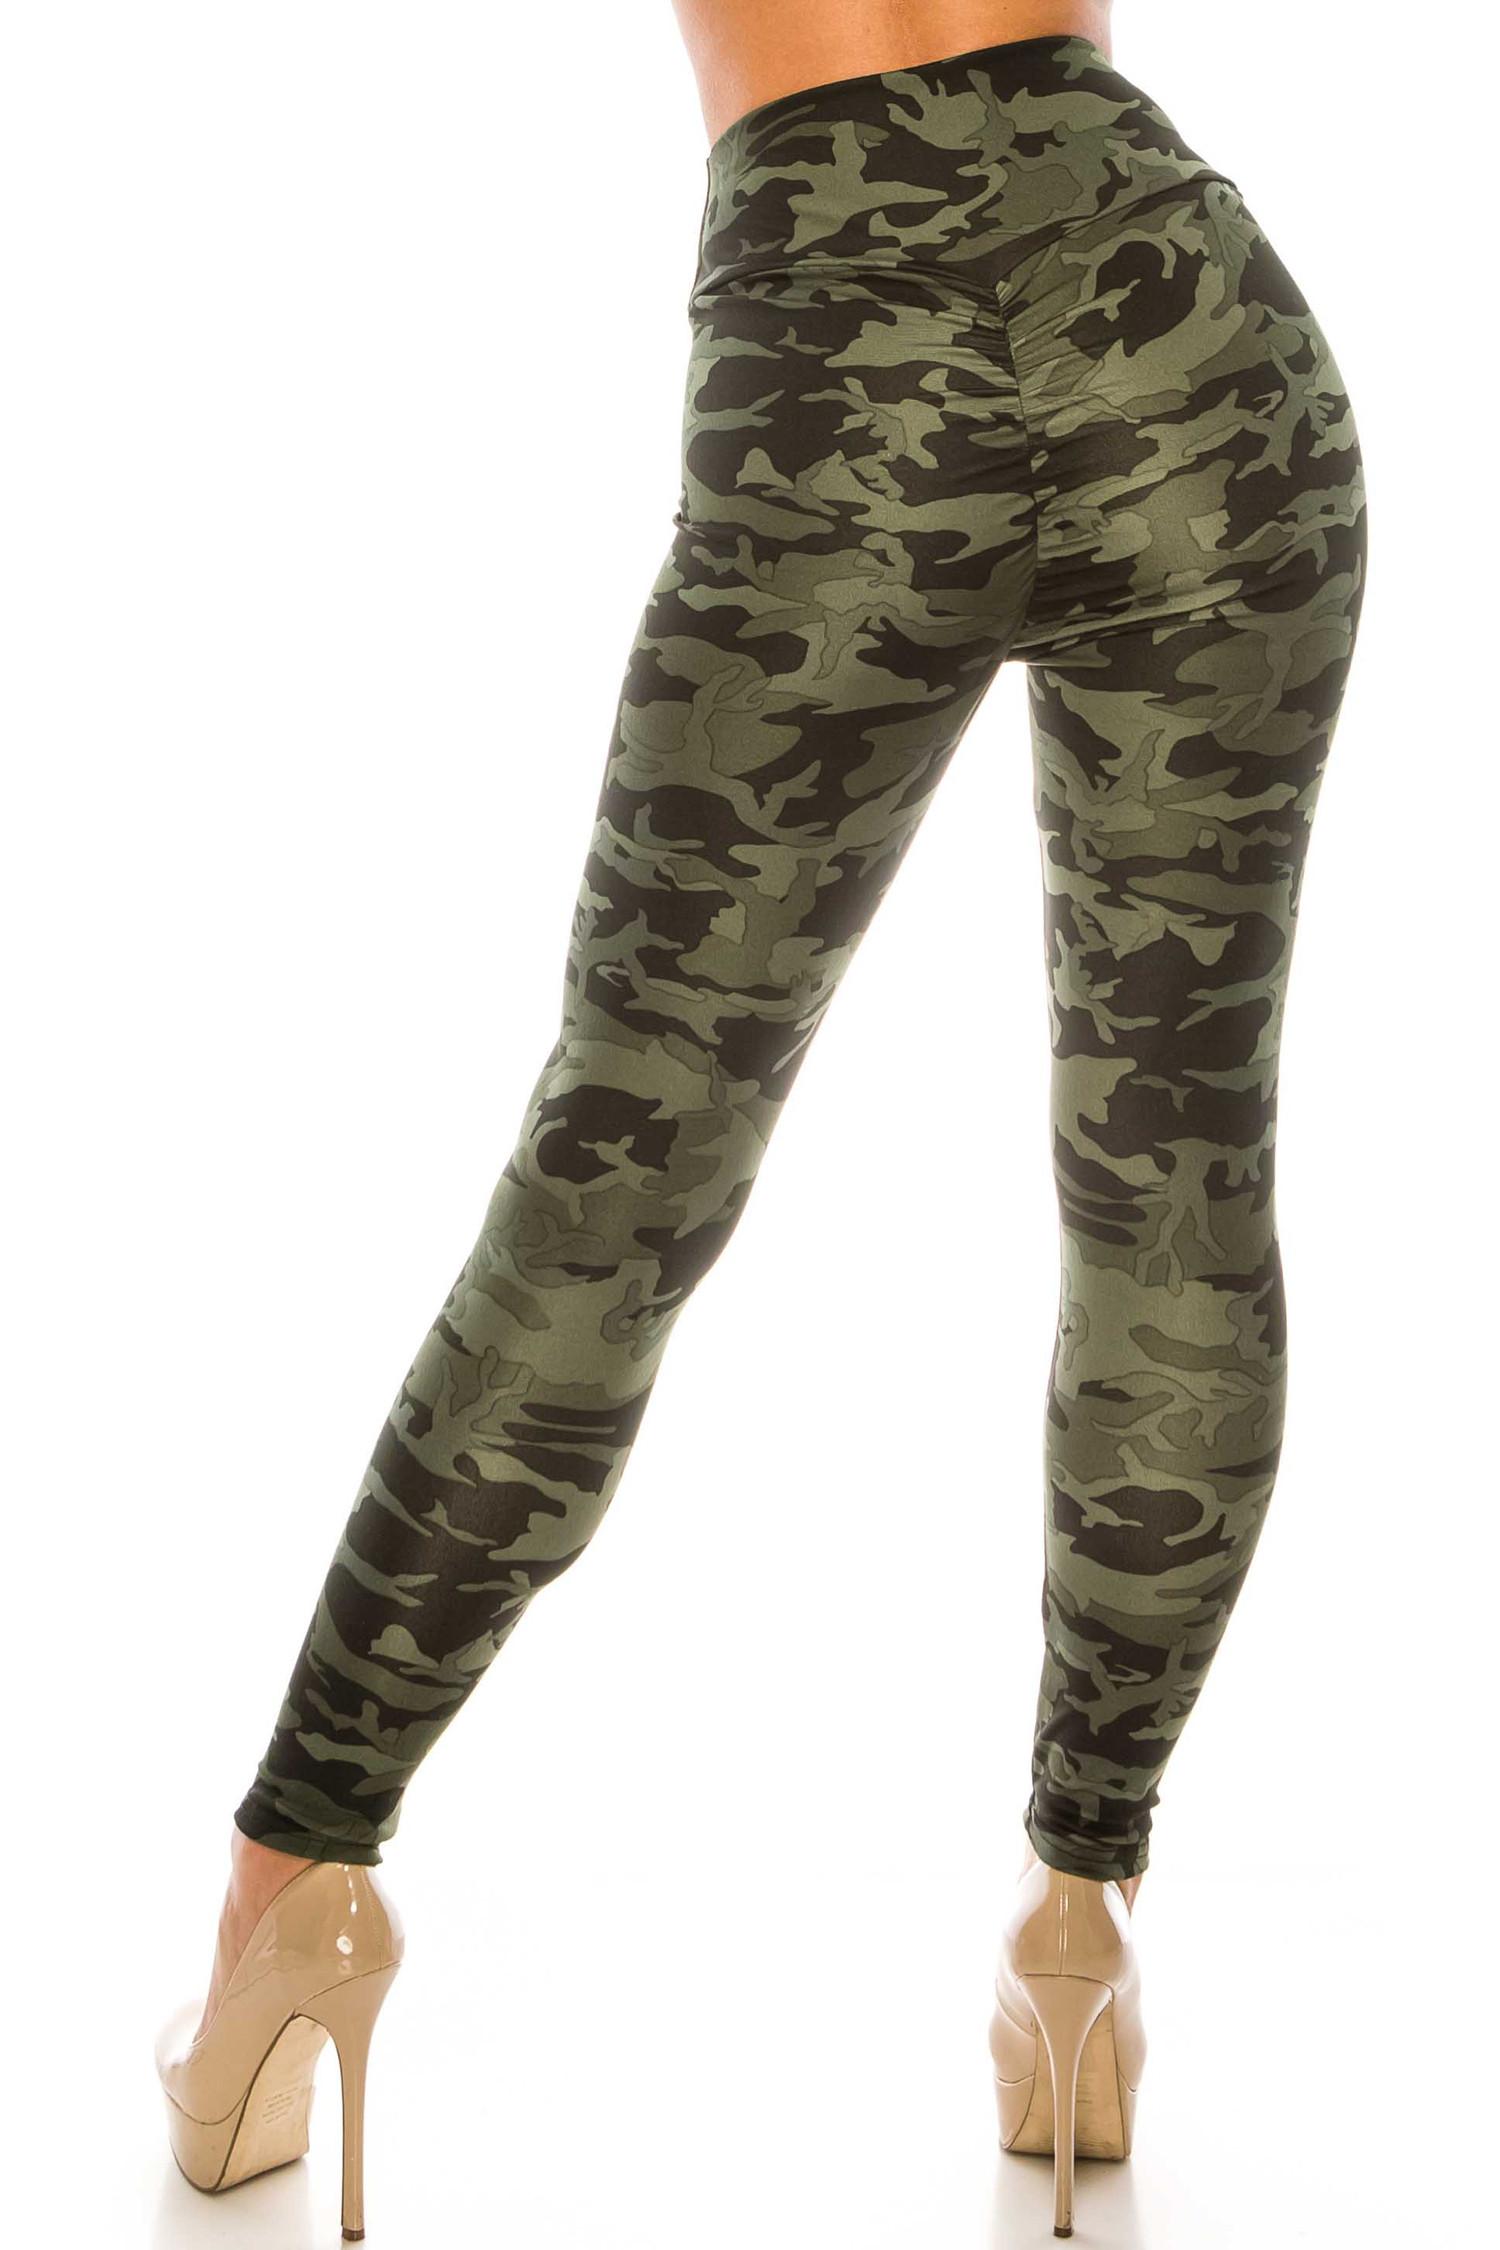 Dark Olive Camouflage Scrunch Butt Sport Leggings